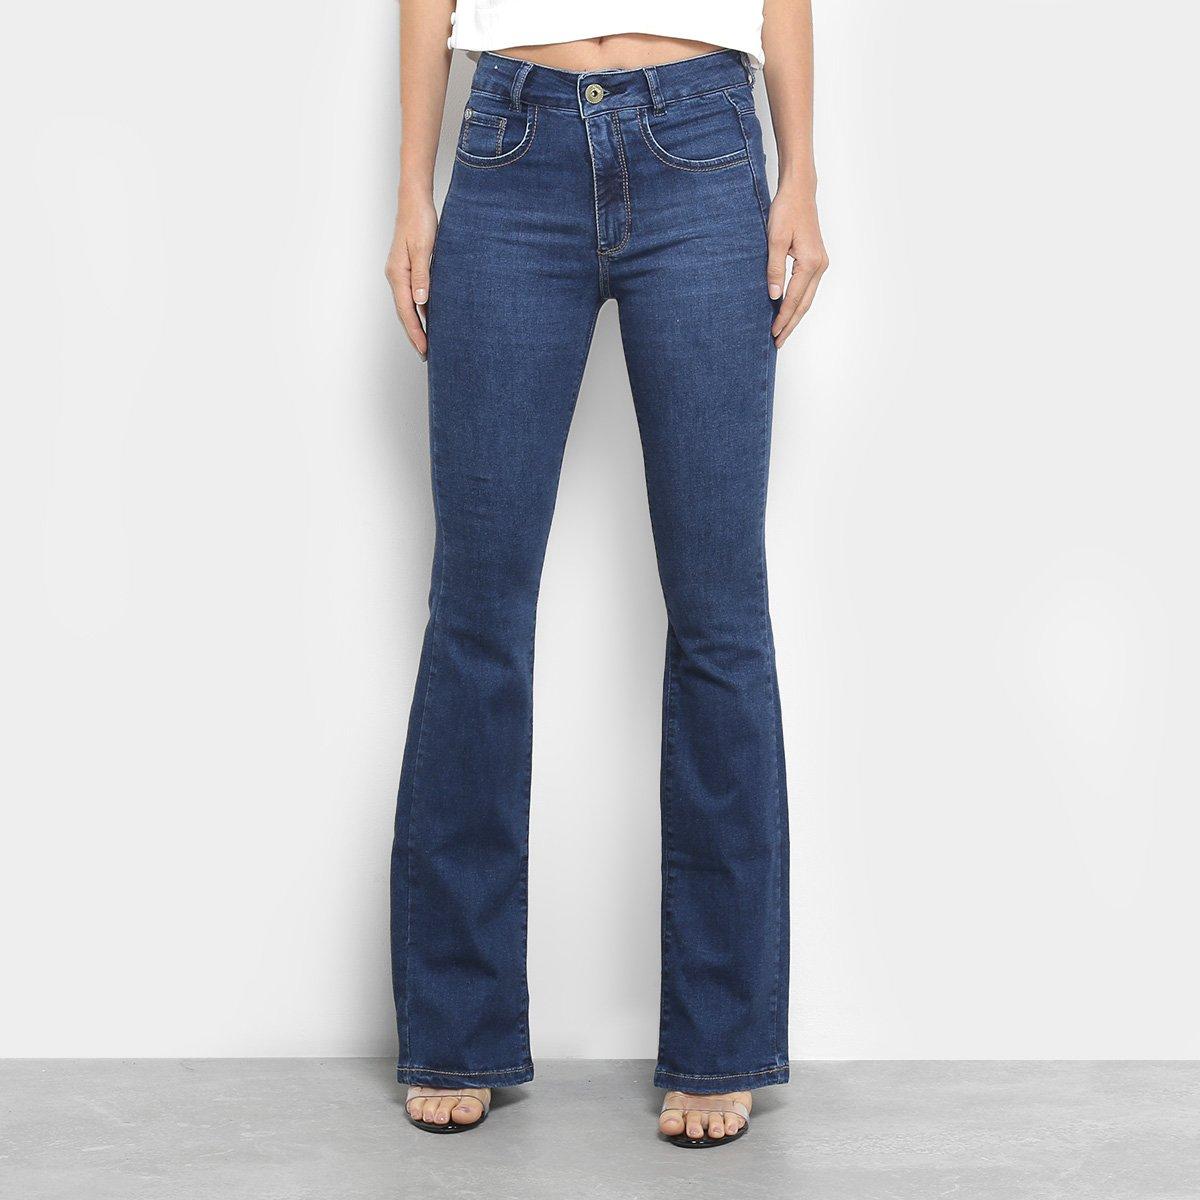 1a9854606 Calça Jeans Flare Maria Filó Cintura Média Feminina